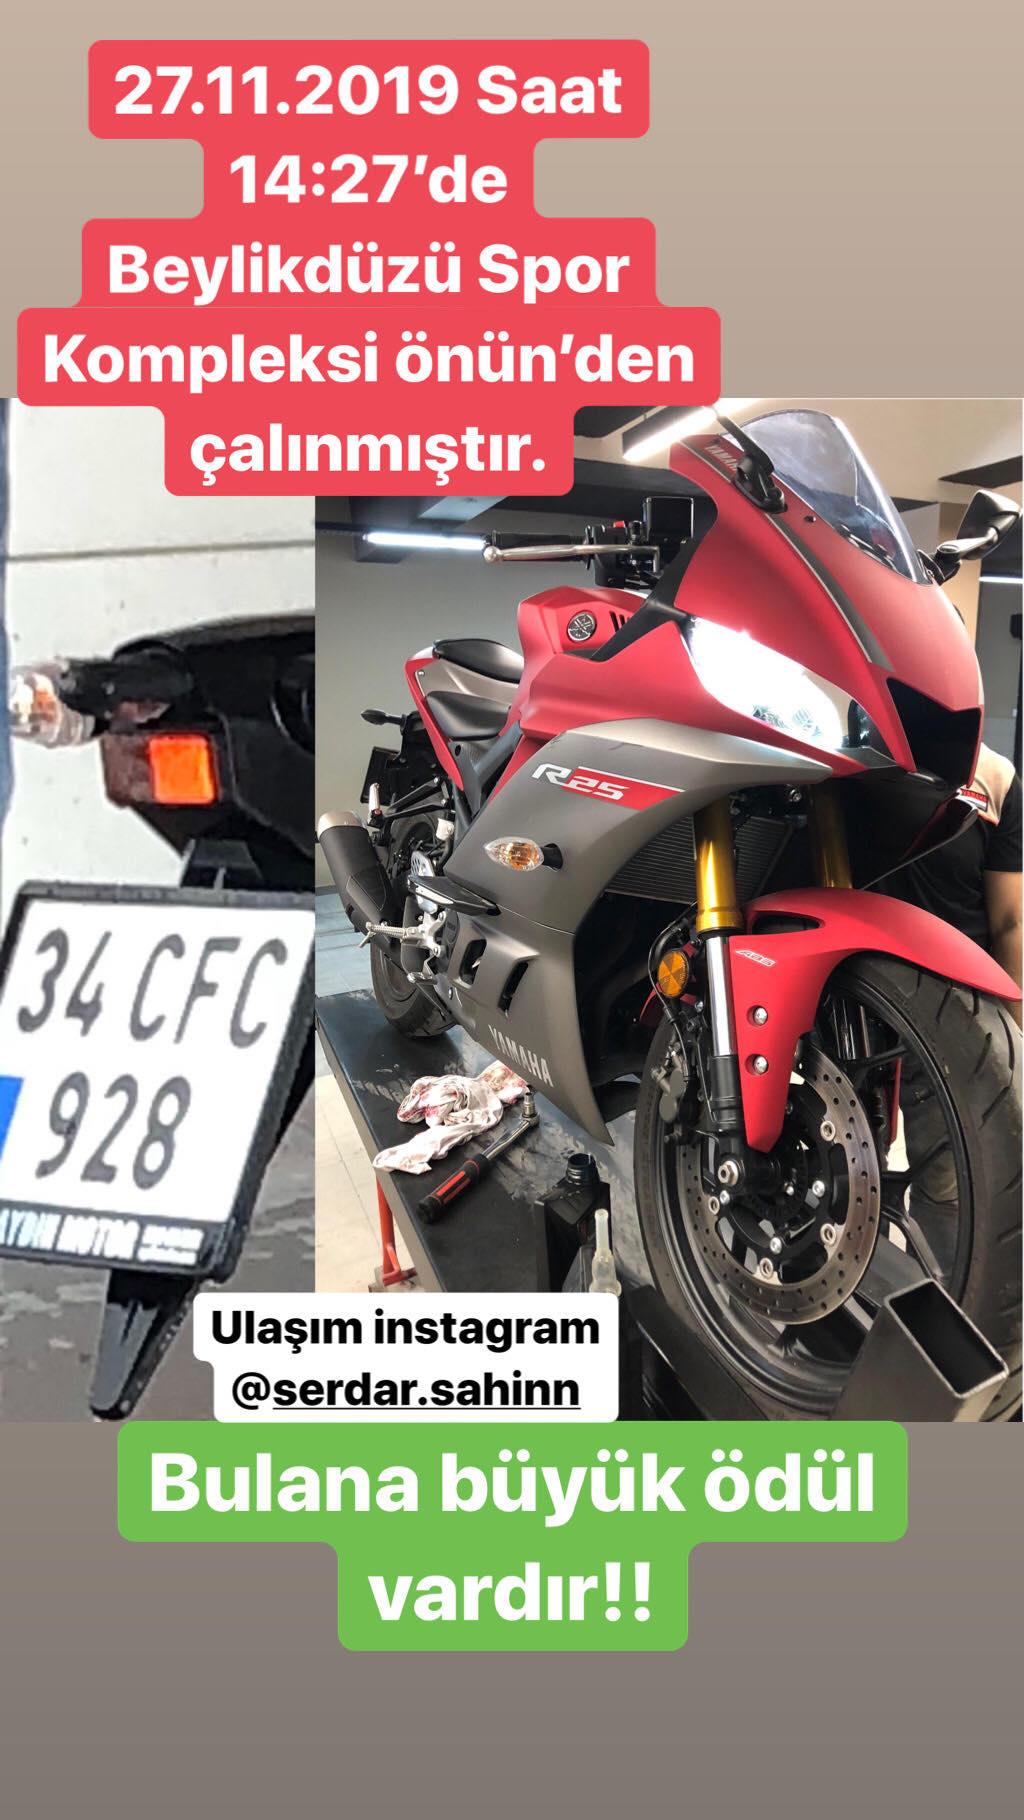 KAYIP YAMAHA R25 2019 KASA KIRMIZI MOTORSİKLET